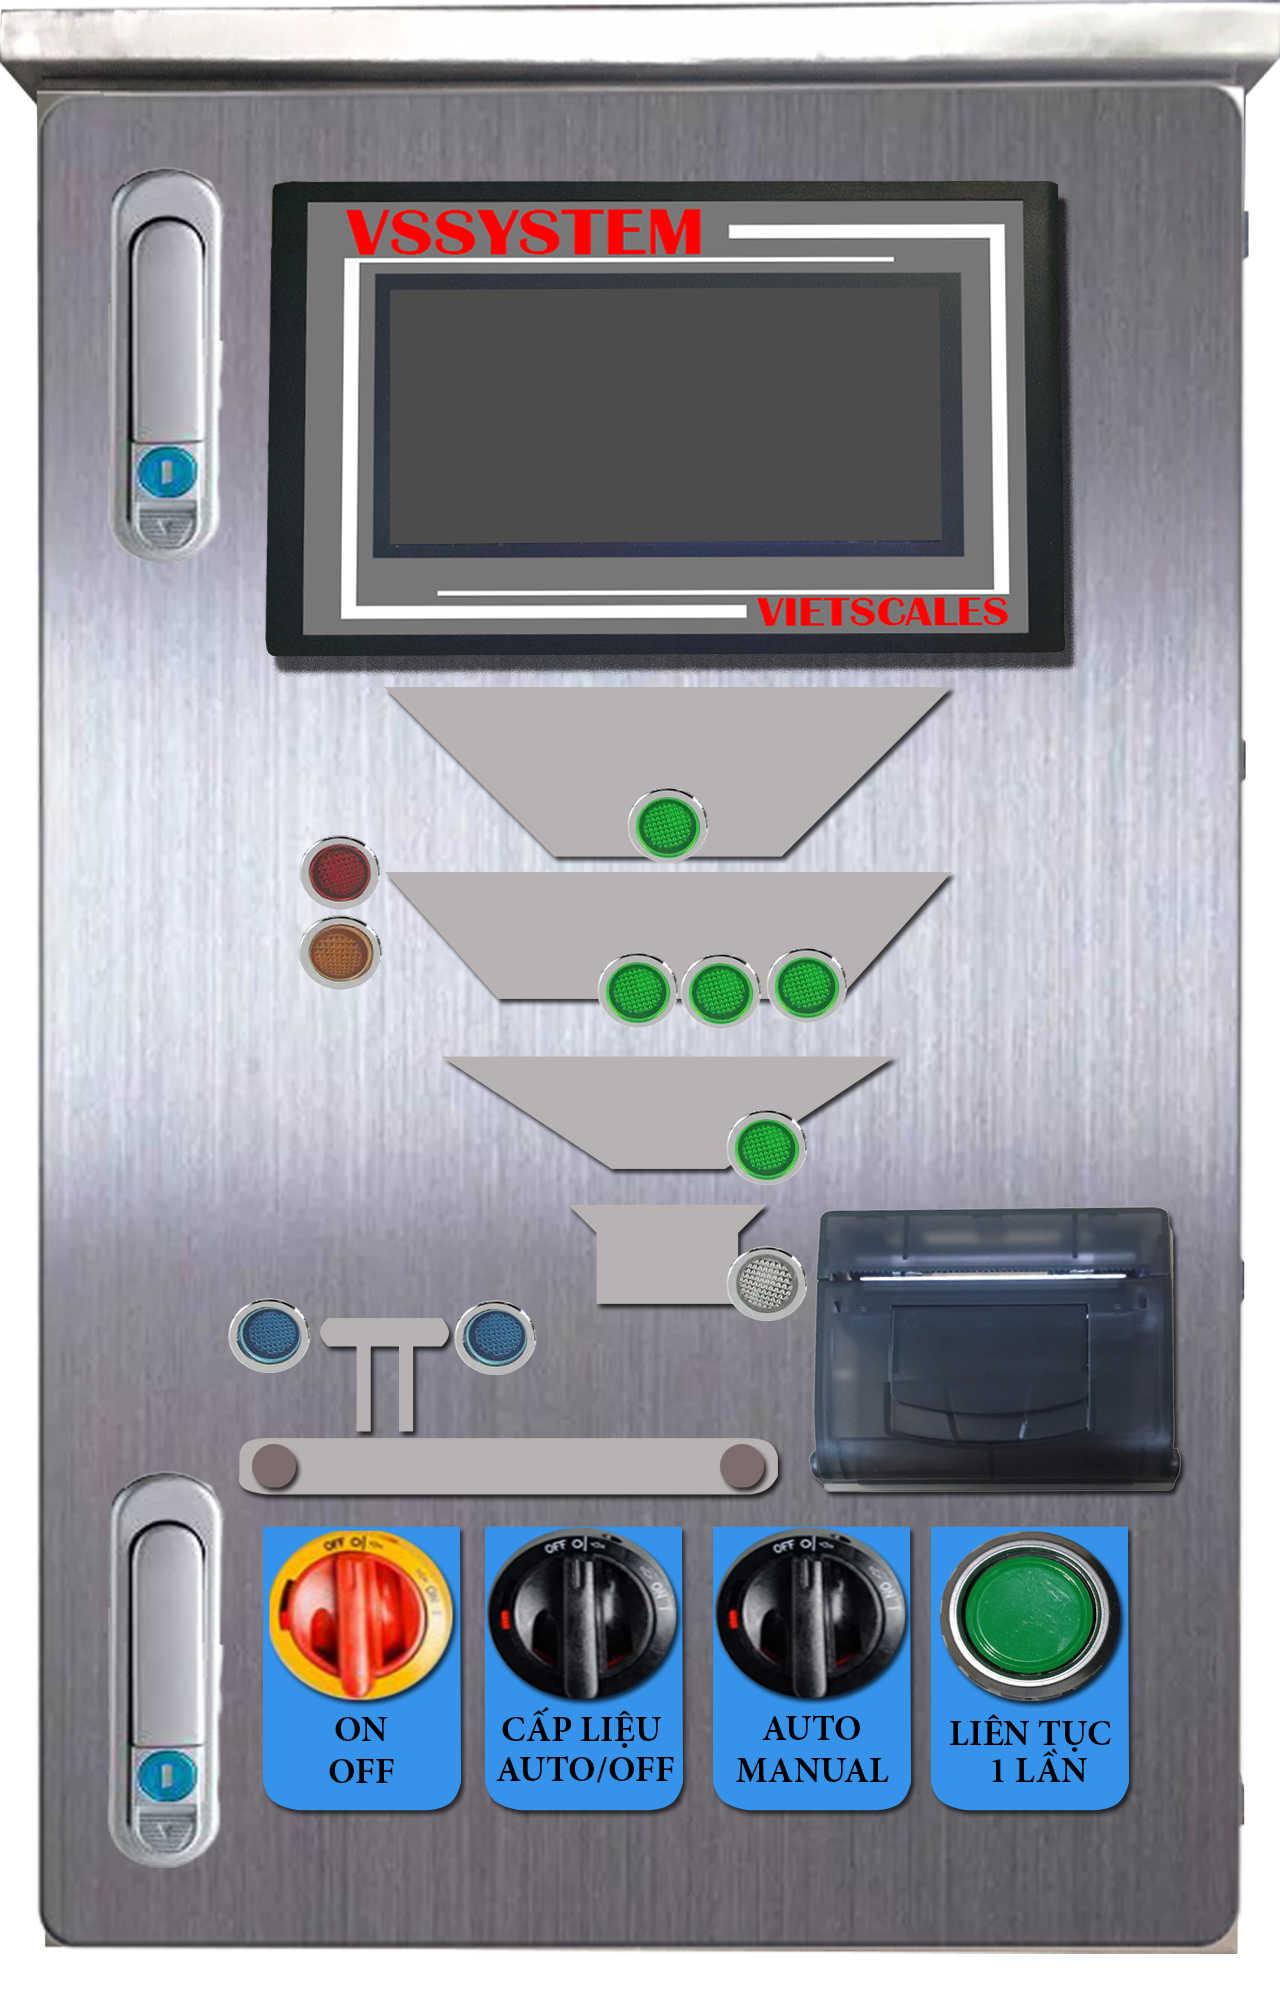 bo-dieu-khien-can-dong-bao-1-pheu-vssystem